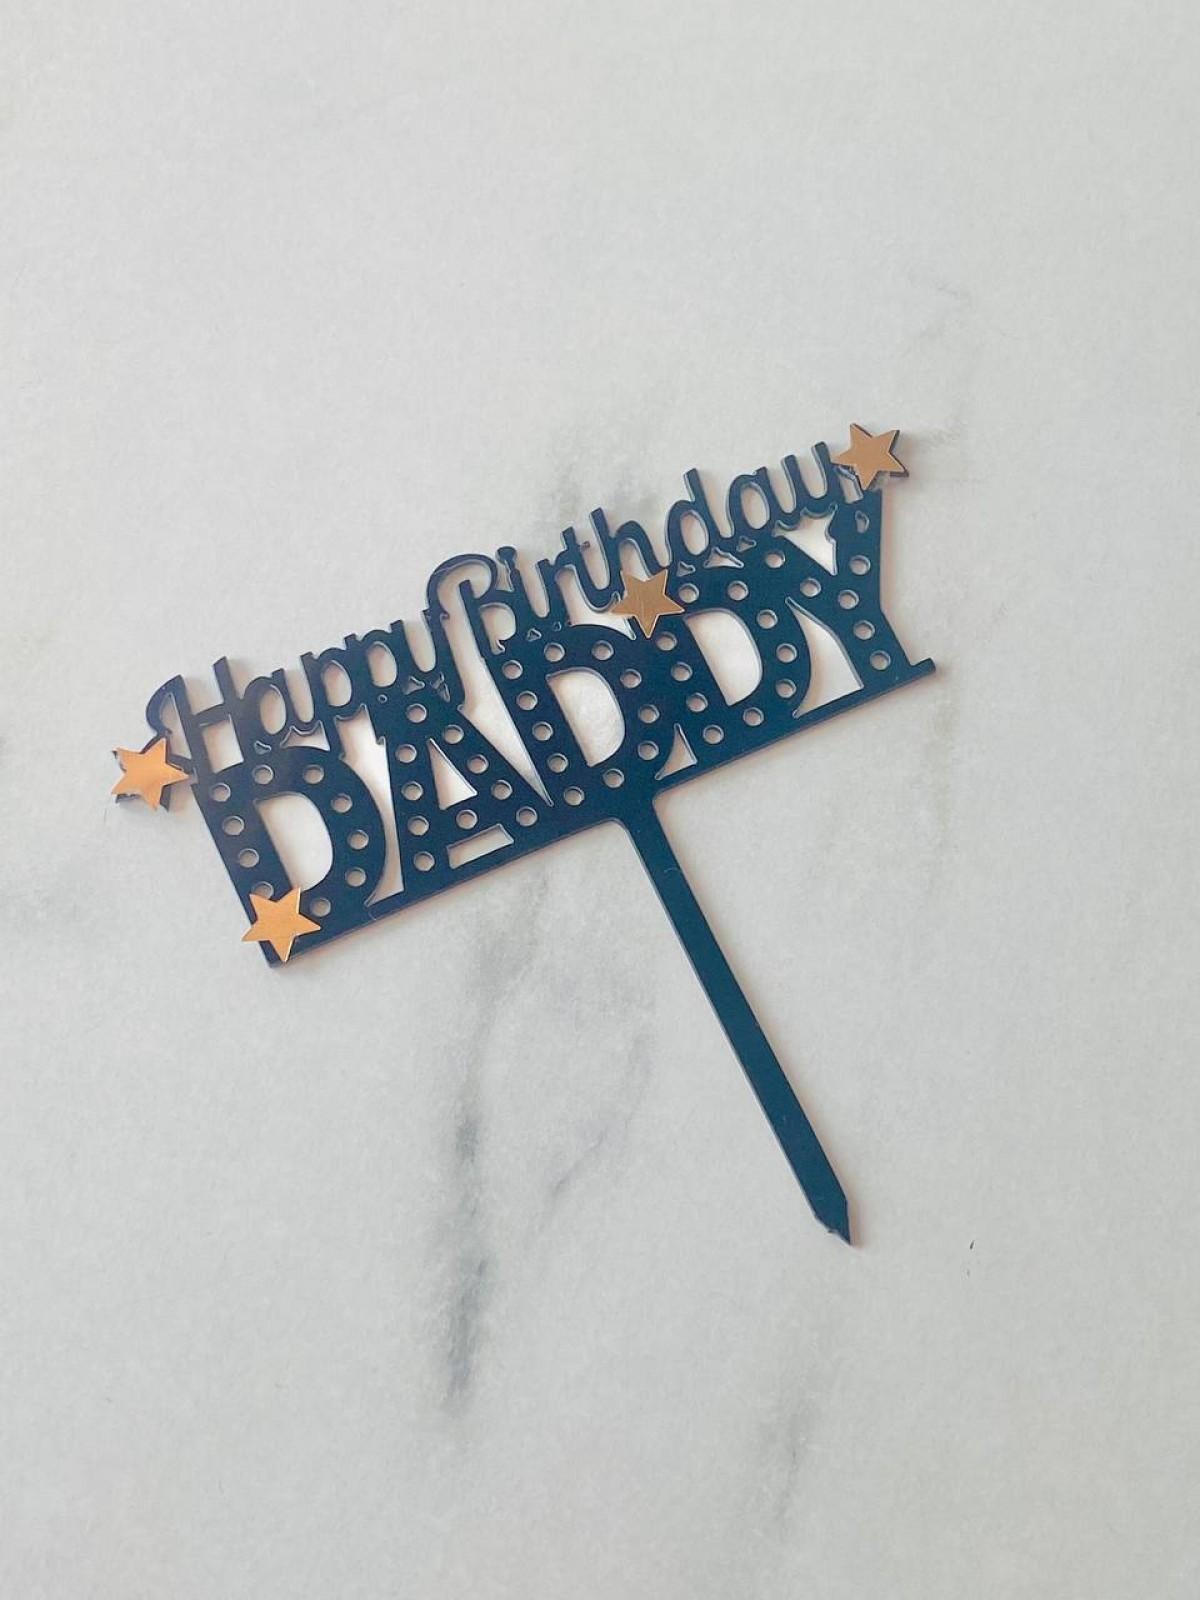 TOPPER HAPPY BIRTHDAY DADDY (THE STAR) - RARA KITCHY